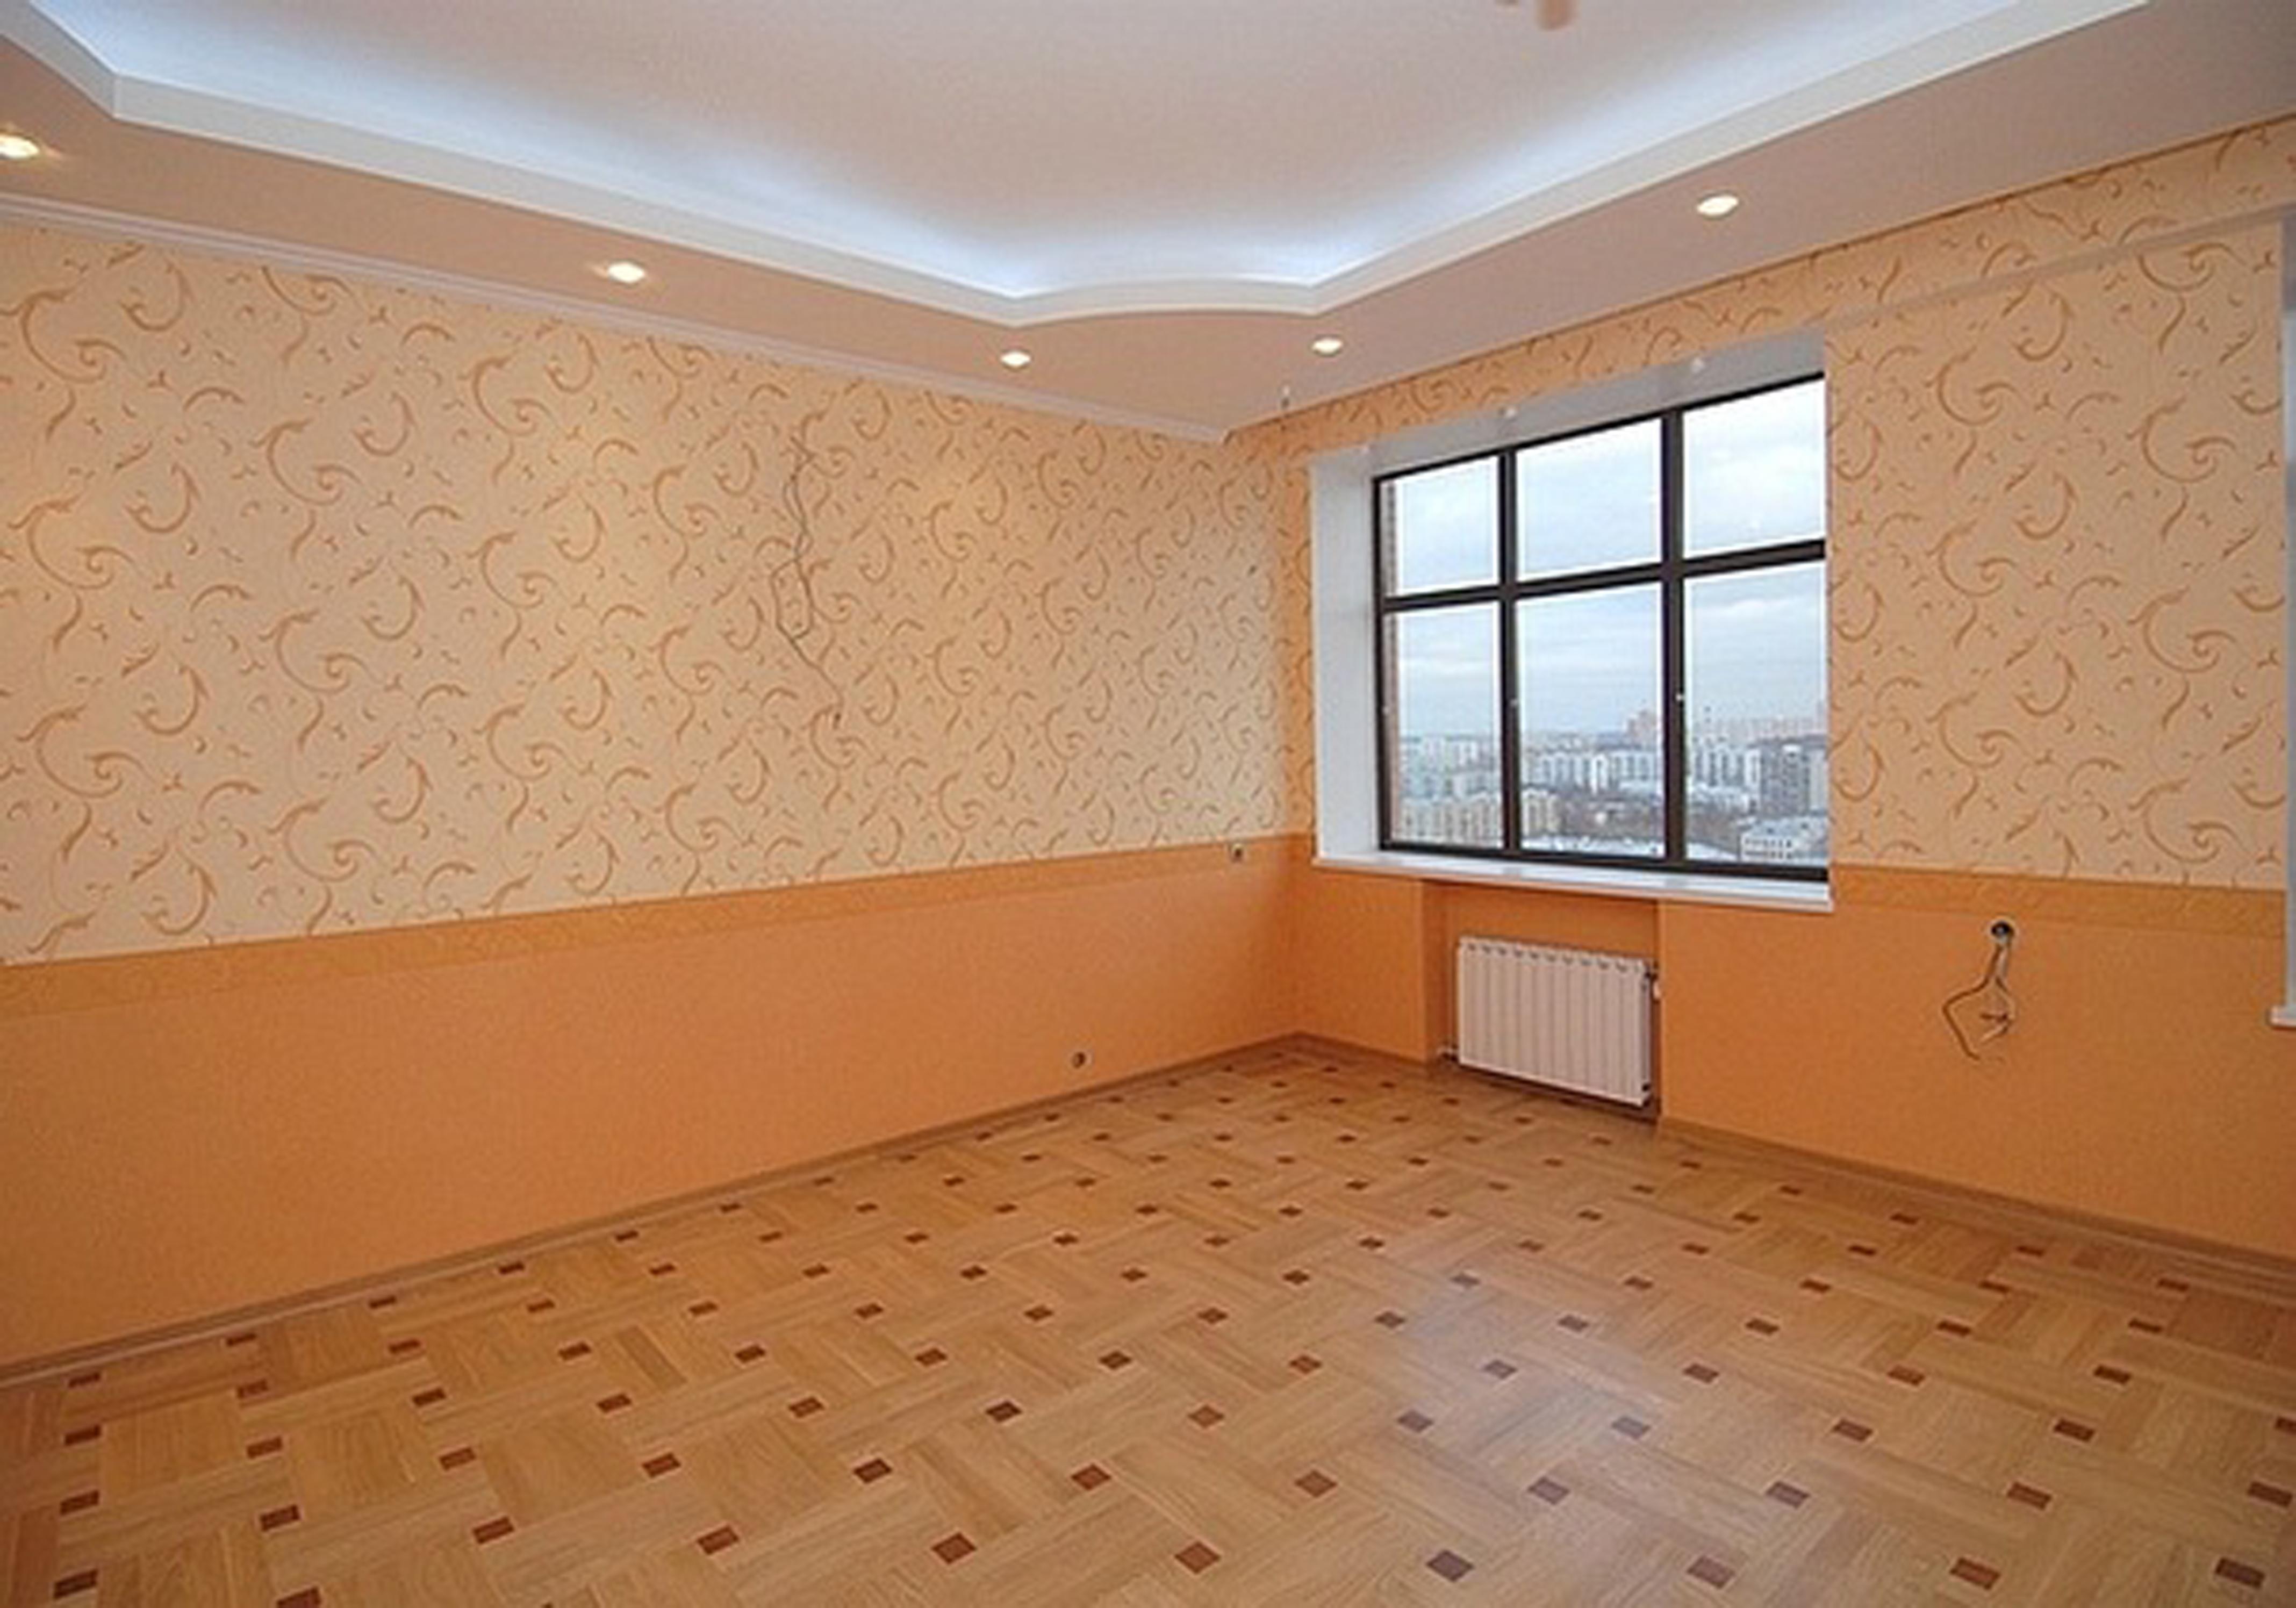 Вам нужен ремонт в квартире? Заходите!